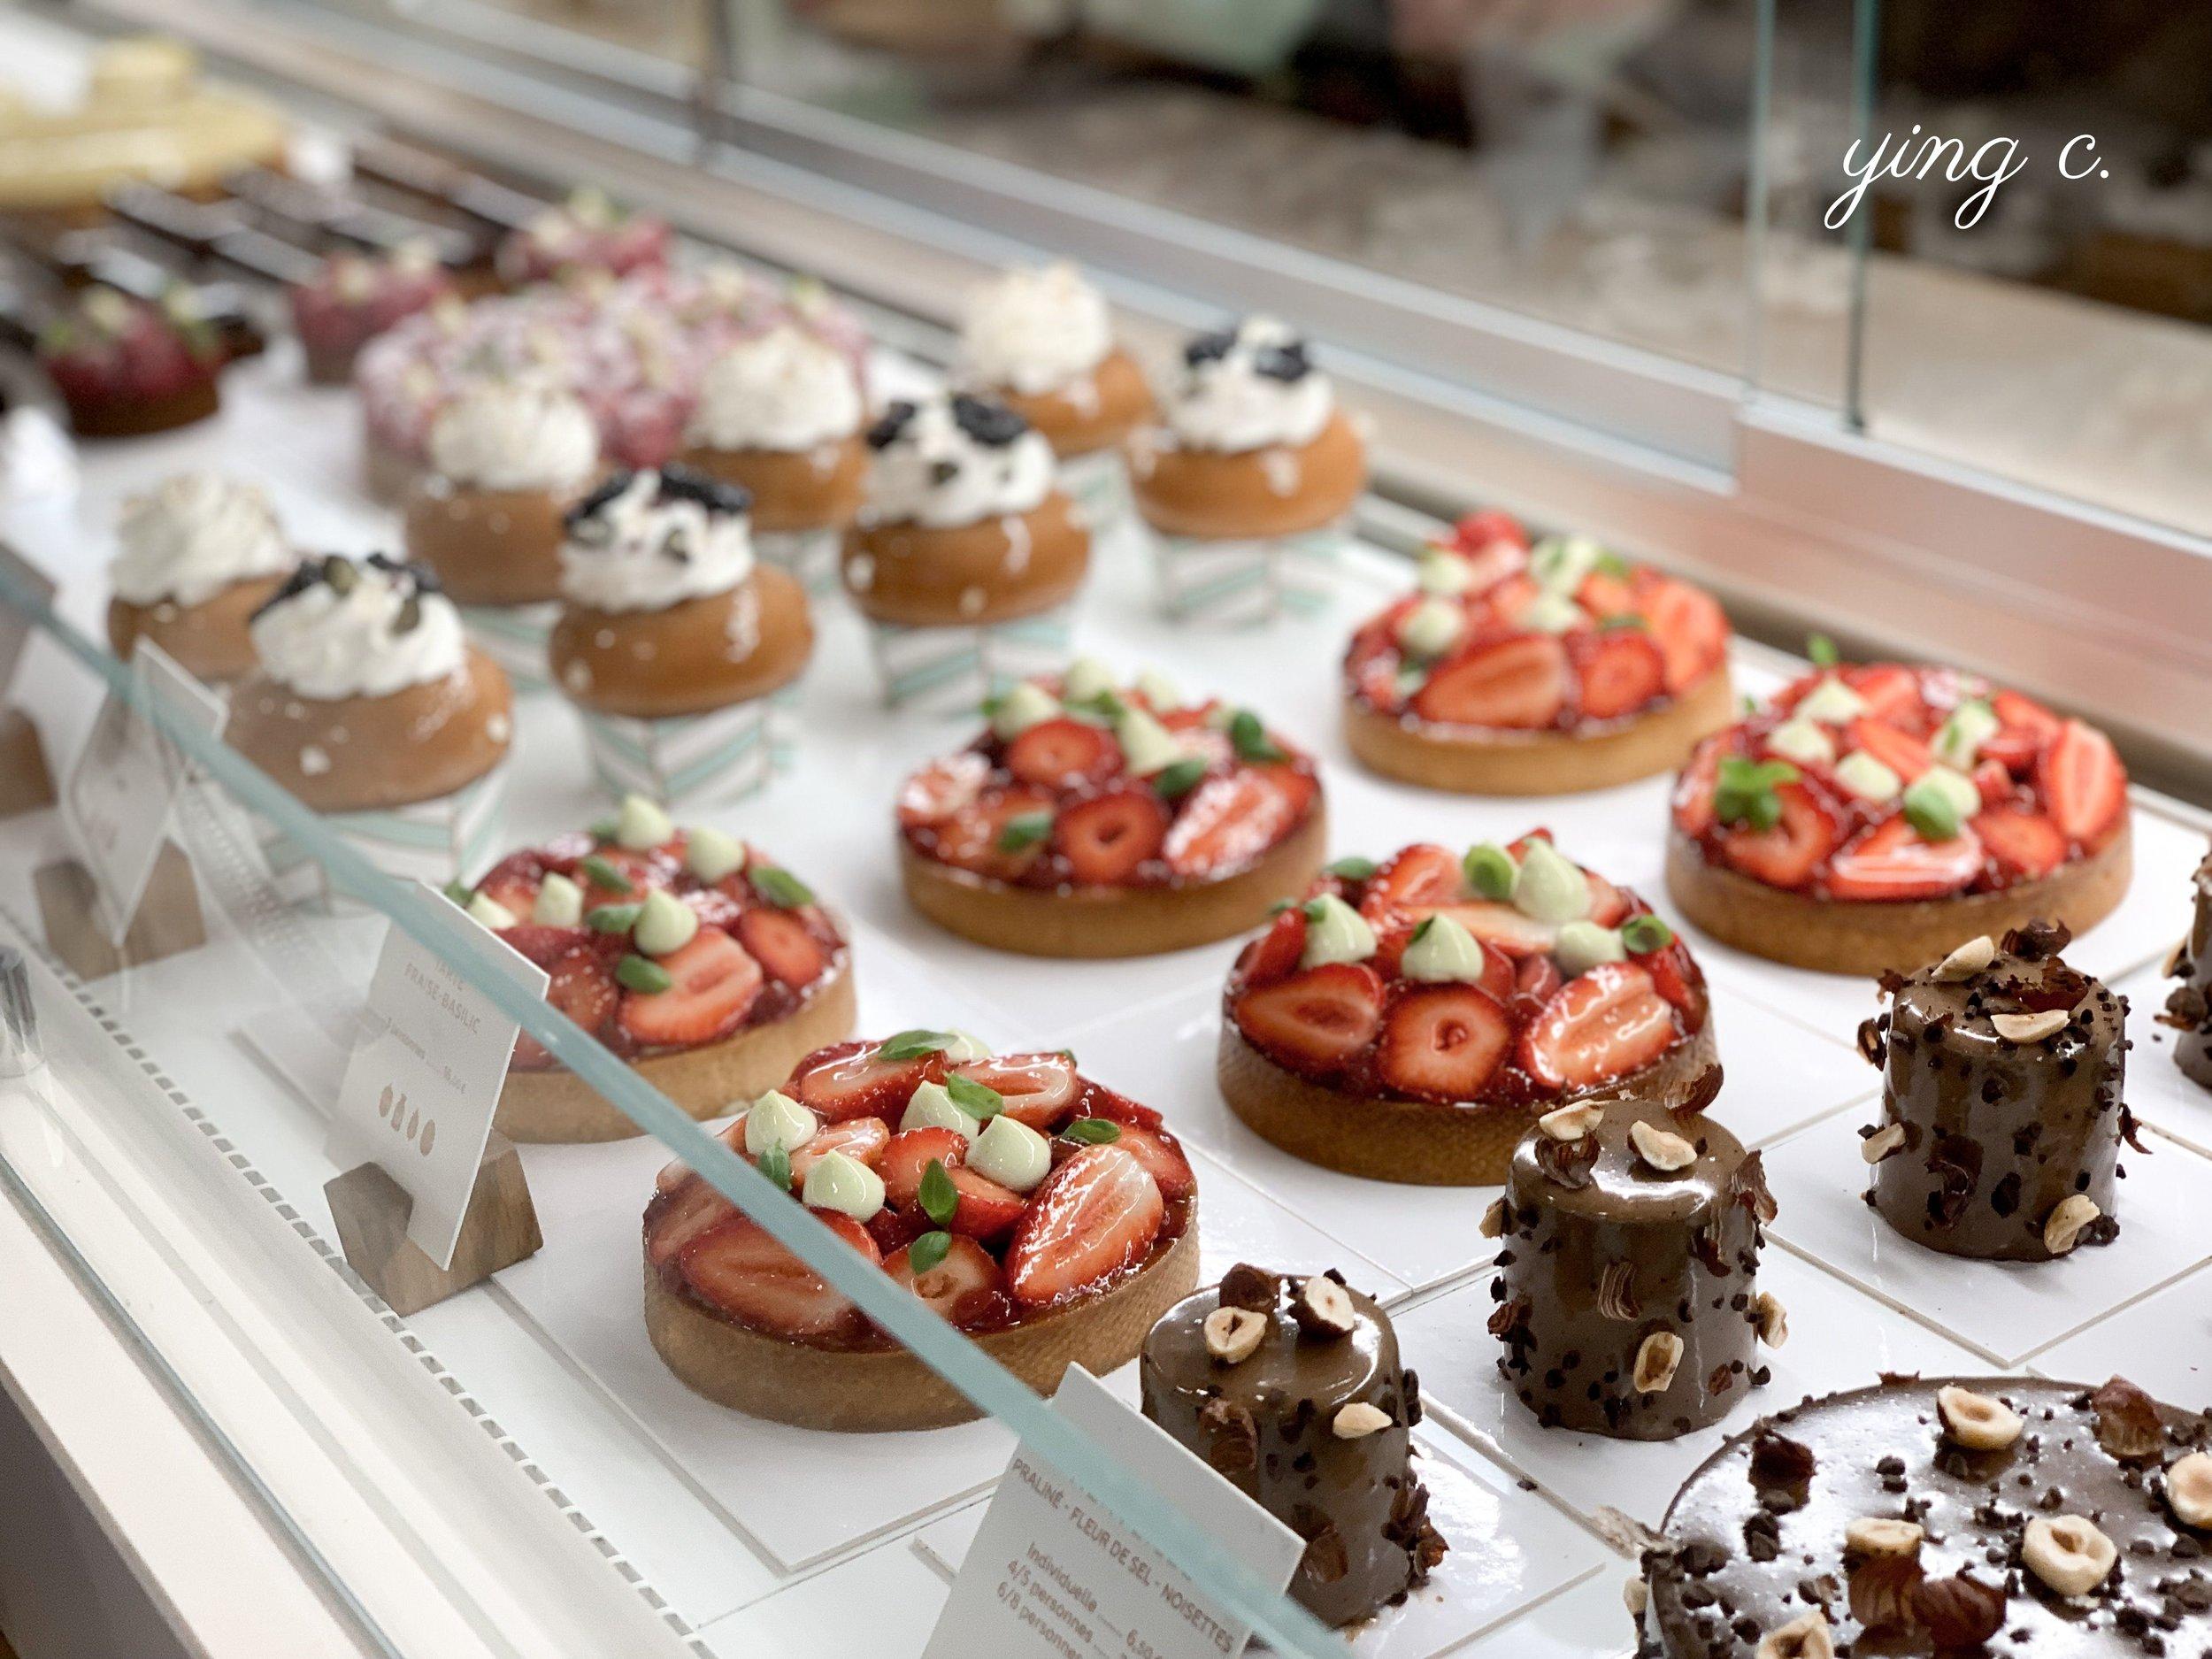 Yann 的甜點店櫥窗內滿是天然無色素、精緻美麗的甜點,他本人卻謙稱「我的甜點沒那麼 Instagrammable 」。